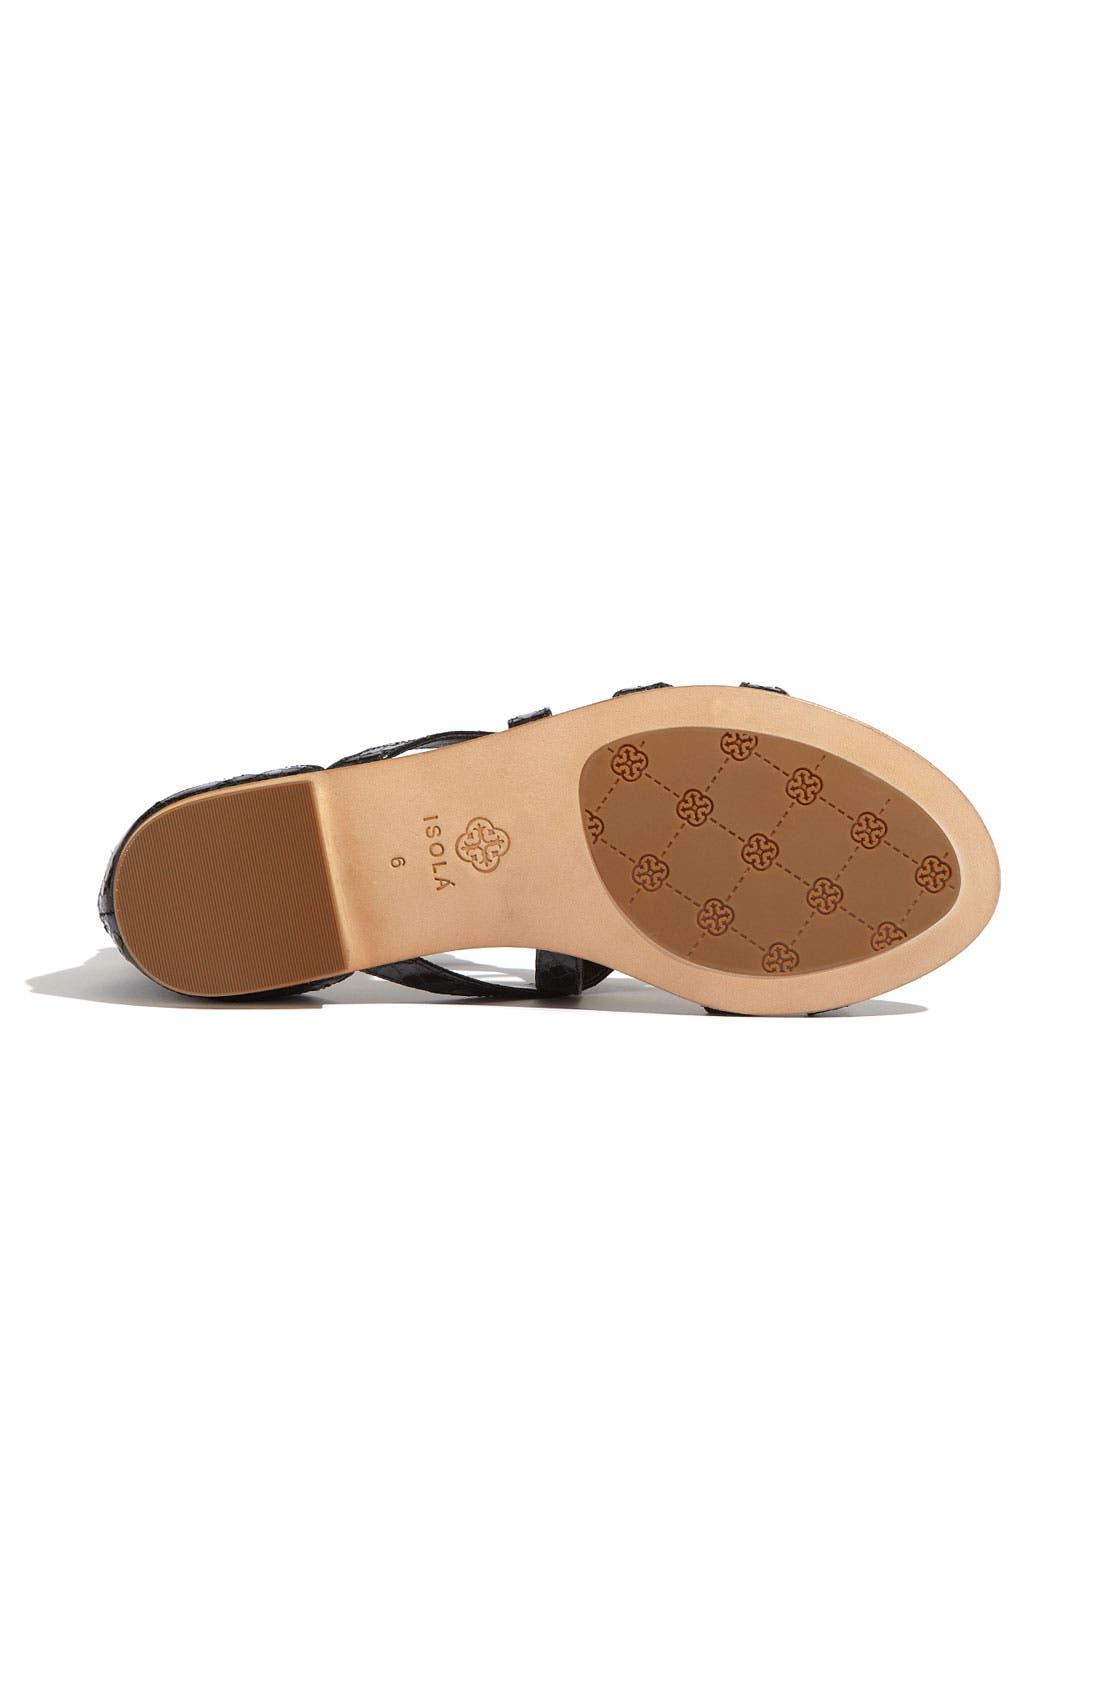 'Adriel' Flat Sandal,                             Alternate thumbnail 3, color,                             001